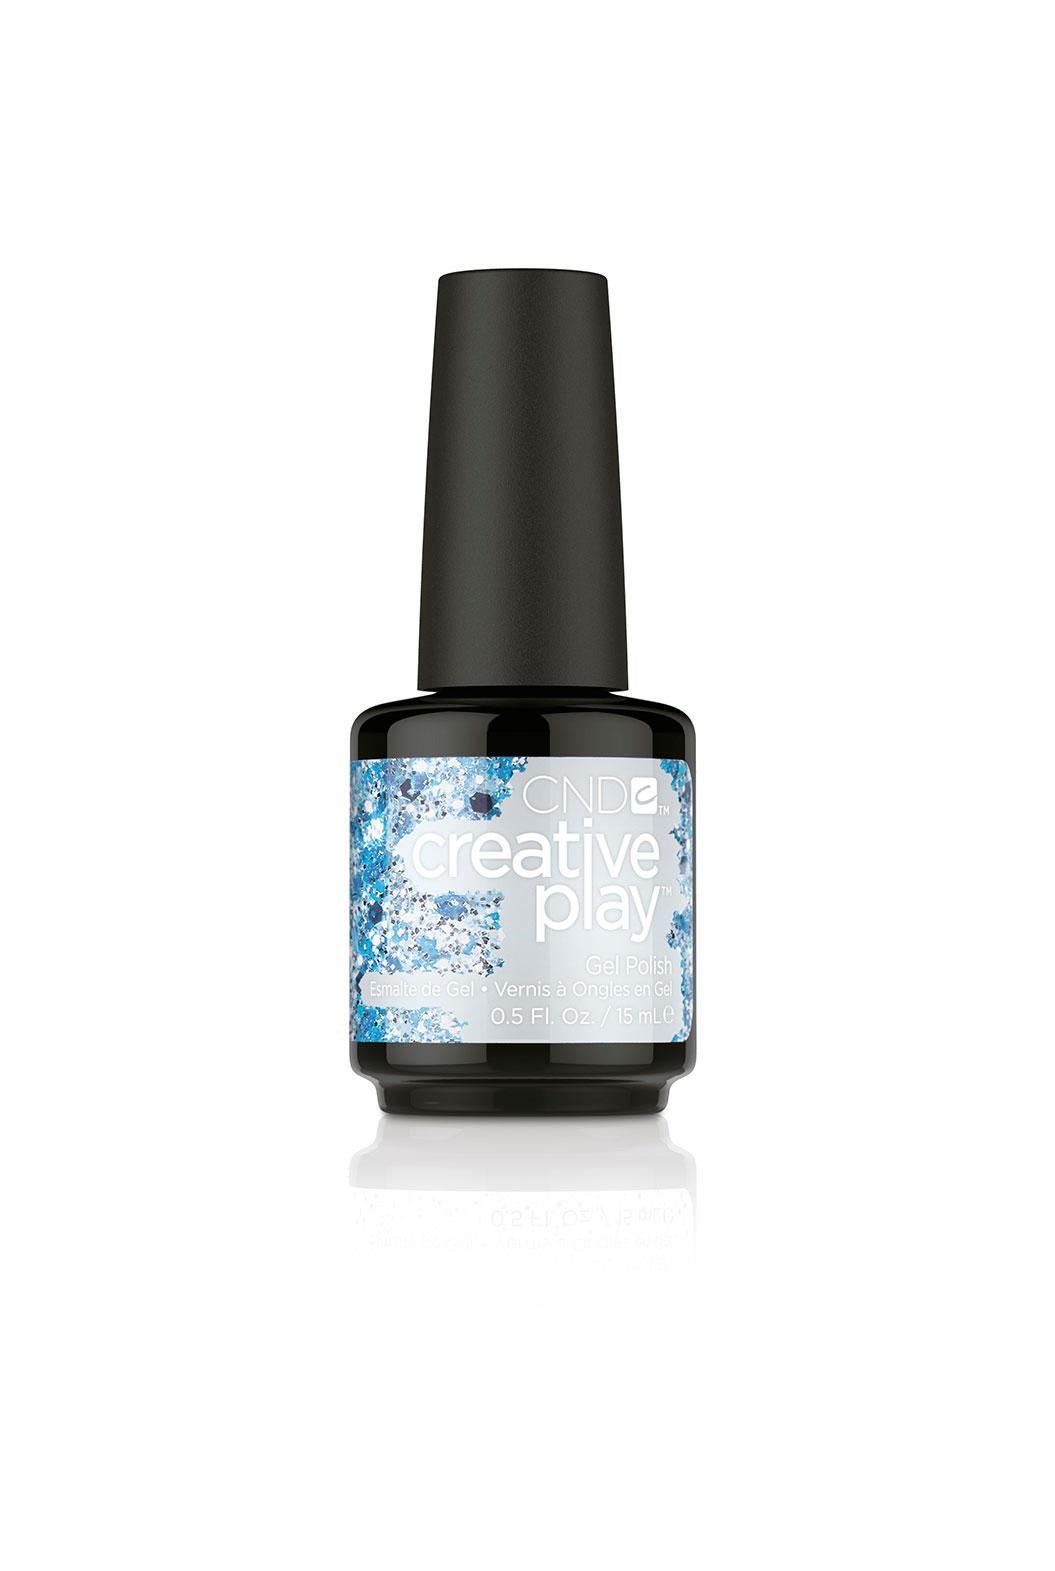 CND 459 гель-лак для ногтей / Kiss Teal Creative Play Gel 15 мл лак для ногтей cnd creative play 459 цвет 459 kiss teal variant hex name 60a8b6